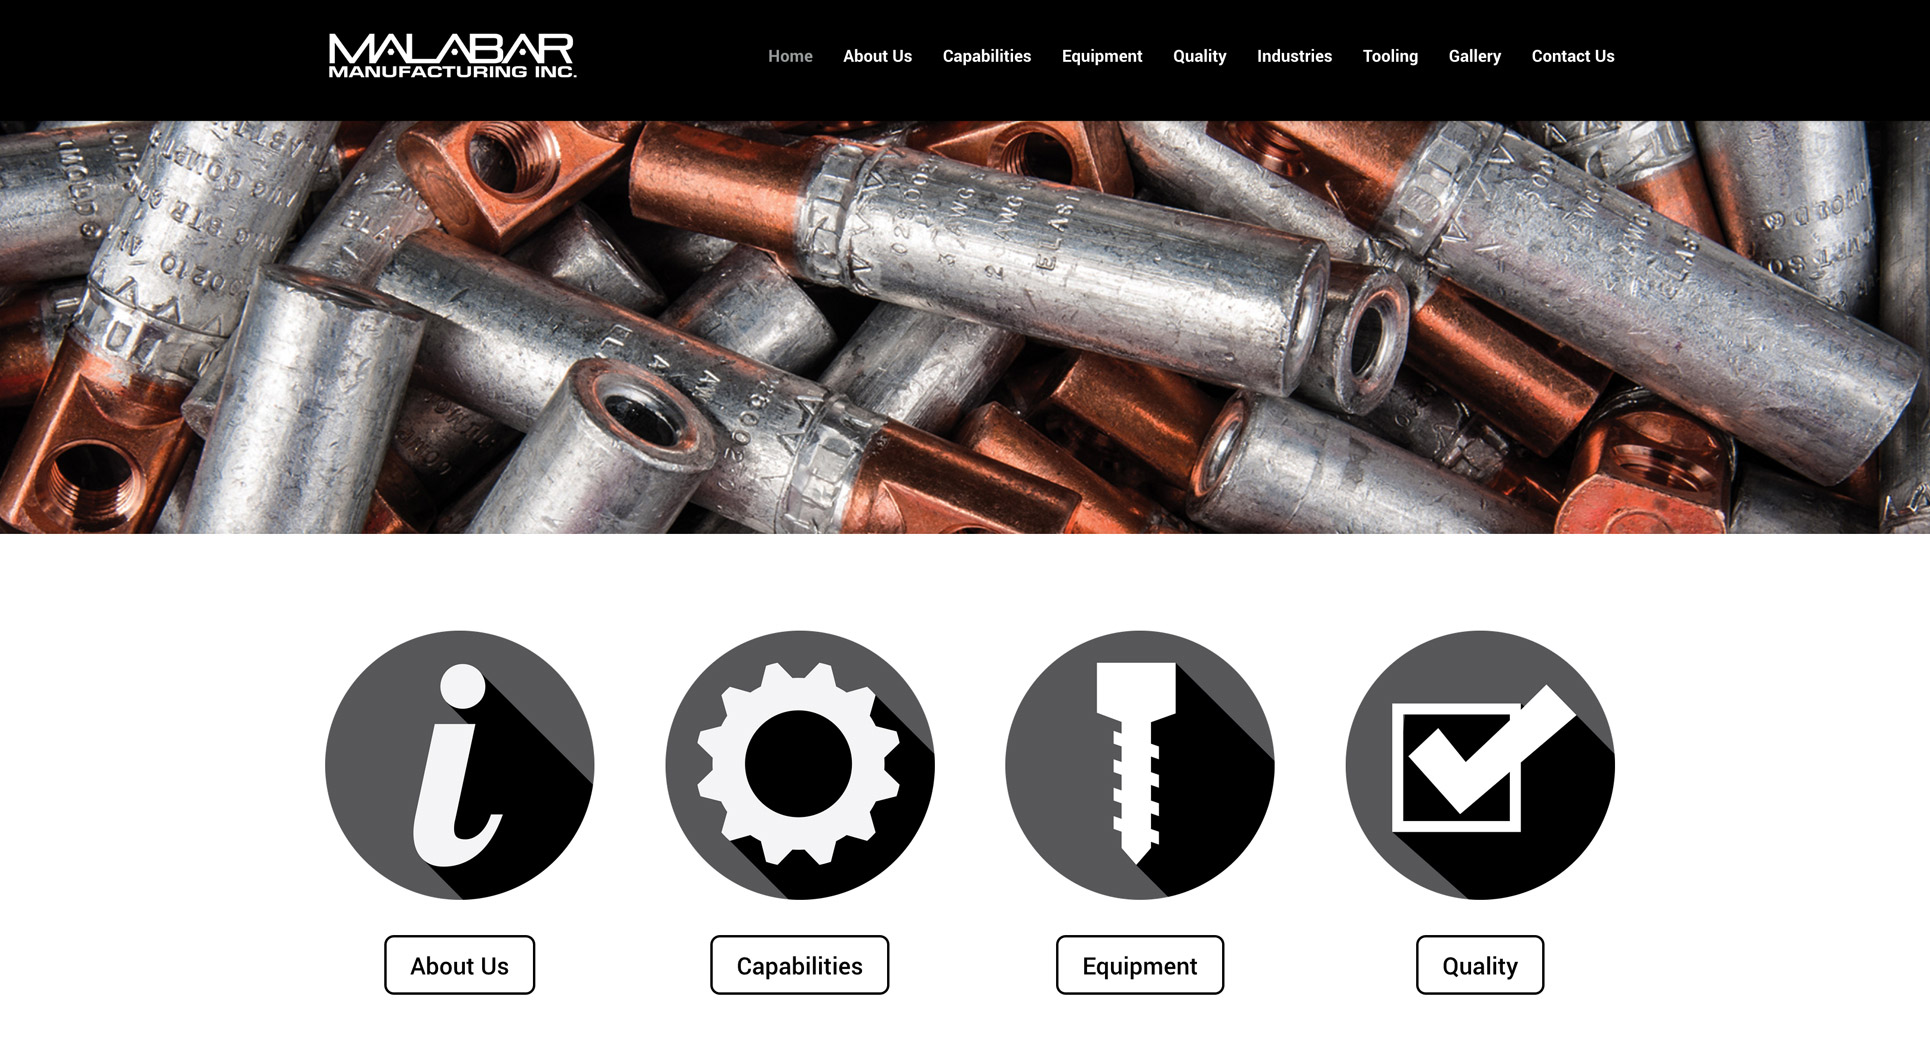 Malabar - Web Development - Lassiter Advertising Inc